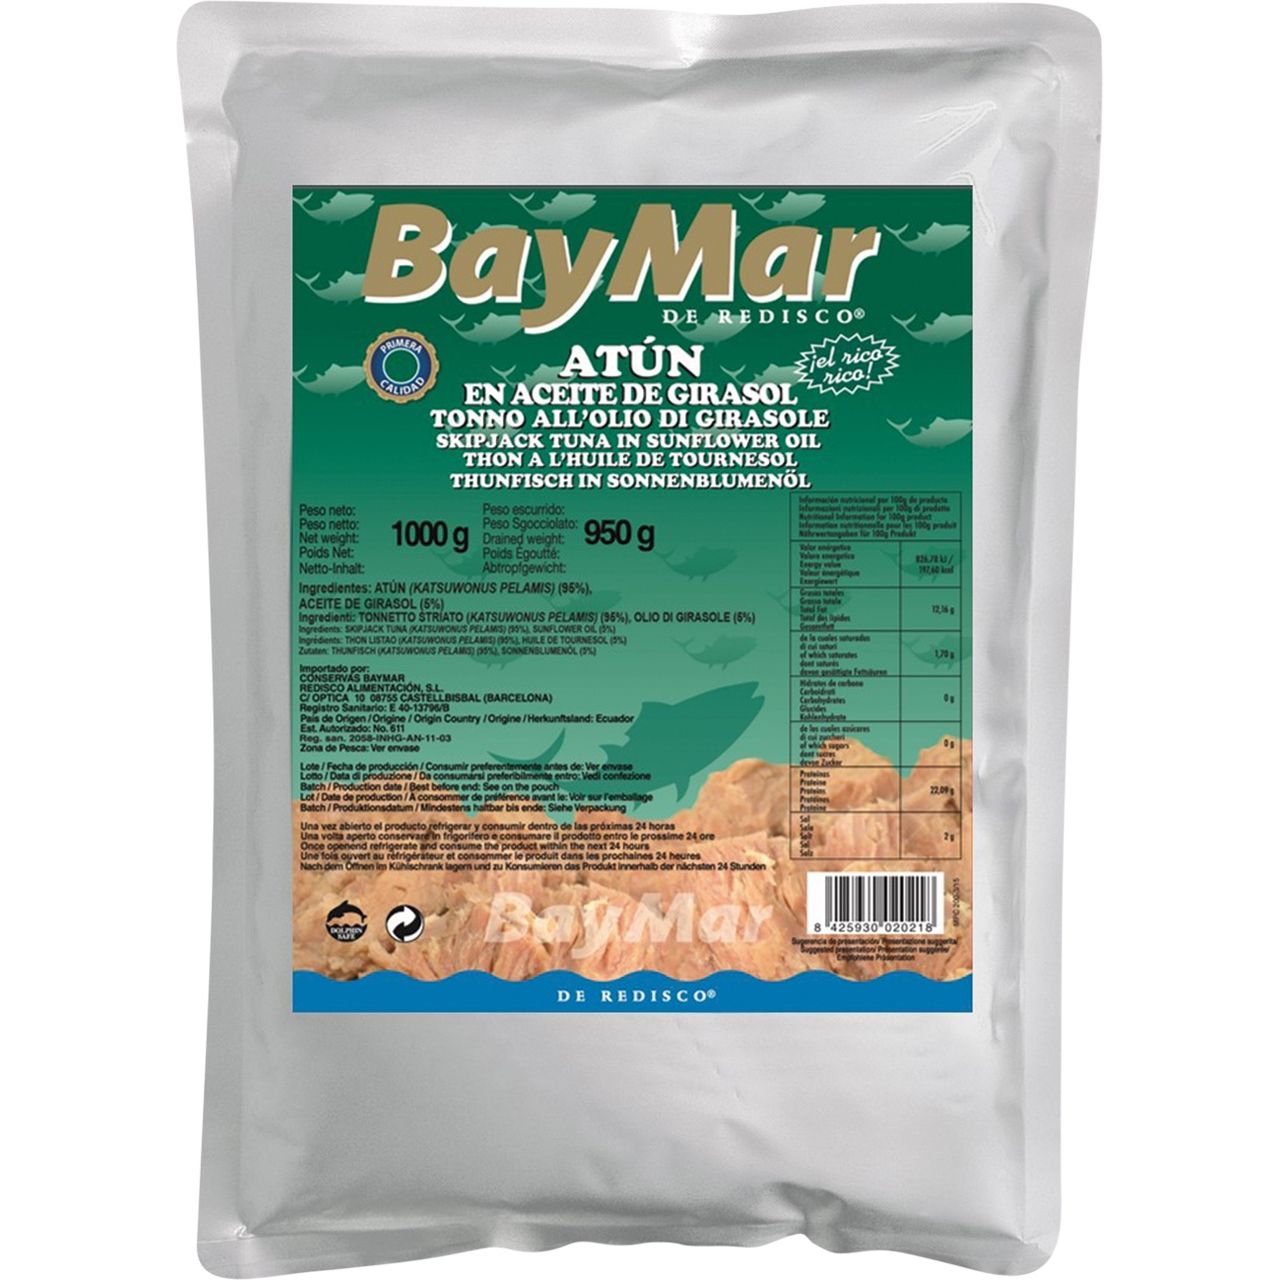 Atún en aceite de girasol 1kg. Baymar